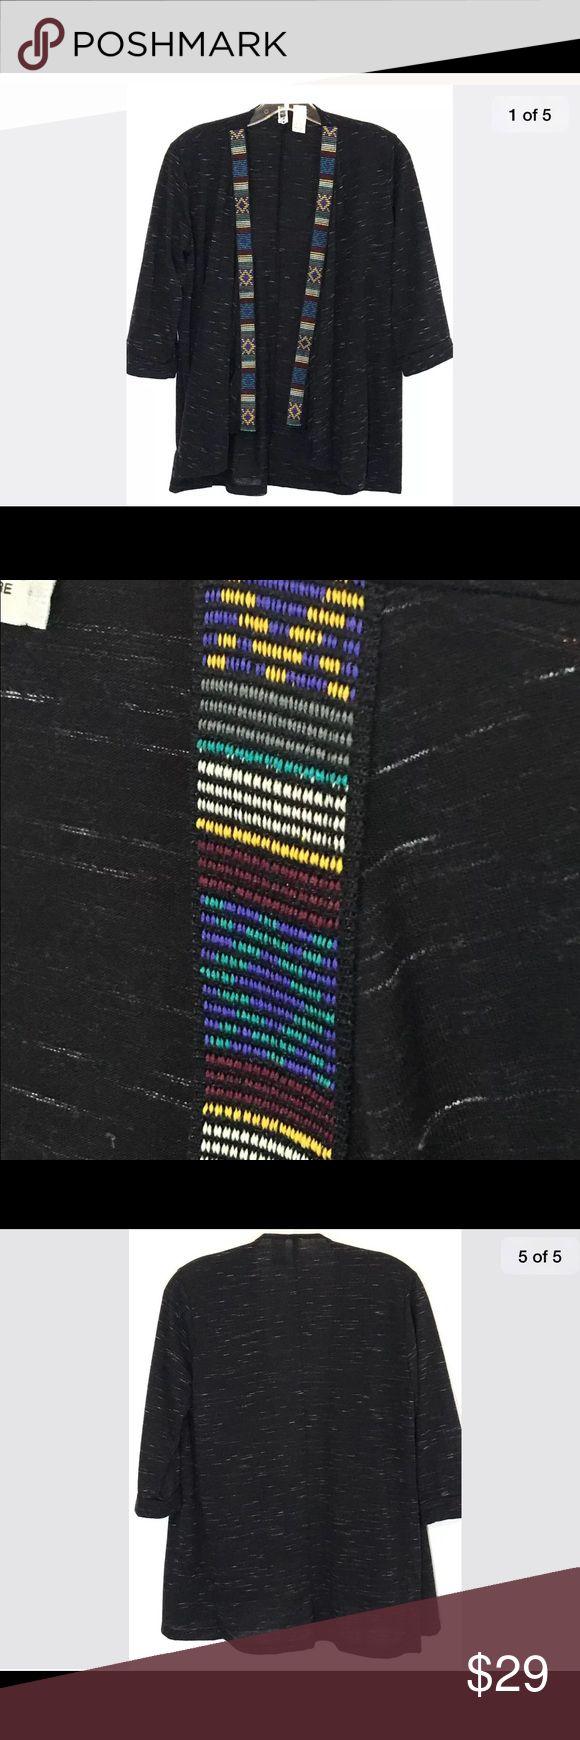 "BKE Aztec Shawl Cardigan Tribal Southwestern XS BKE Aztec Shawl Cardigan Tribal Southwestern 3/4 Sleeves Open Drape Womens XS  Pit to Pit: 18"" Length: 27"" BKE Sweaters Cardigans"